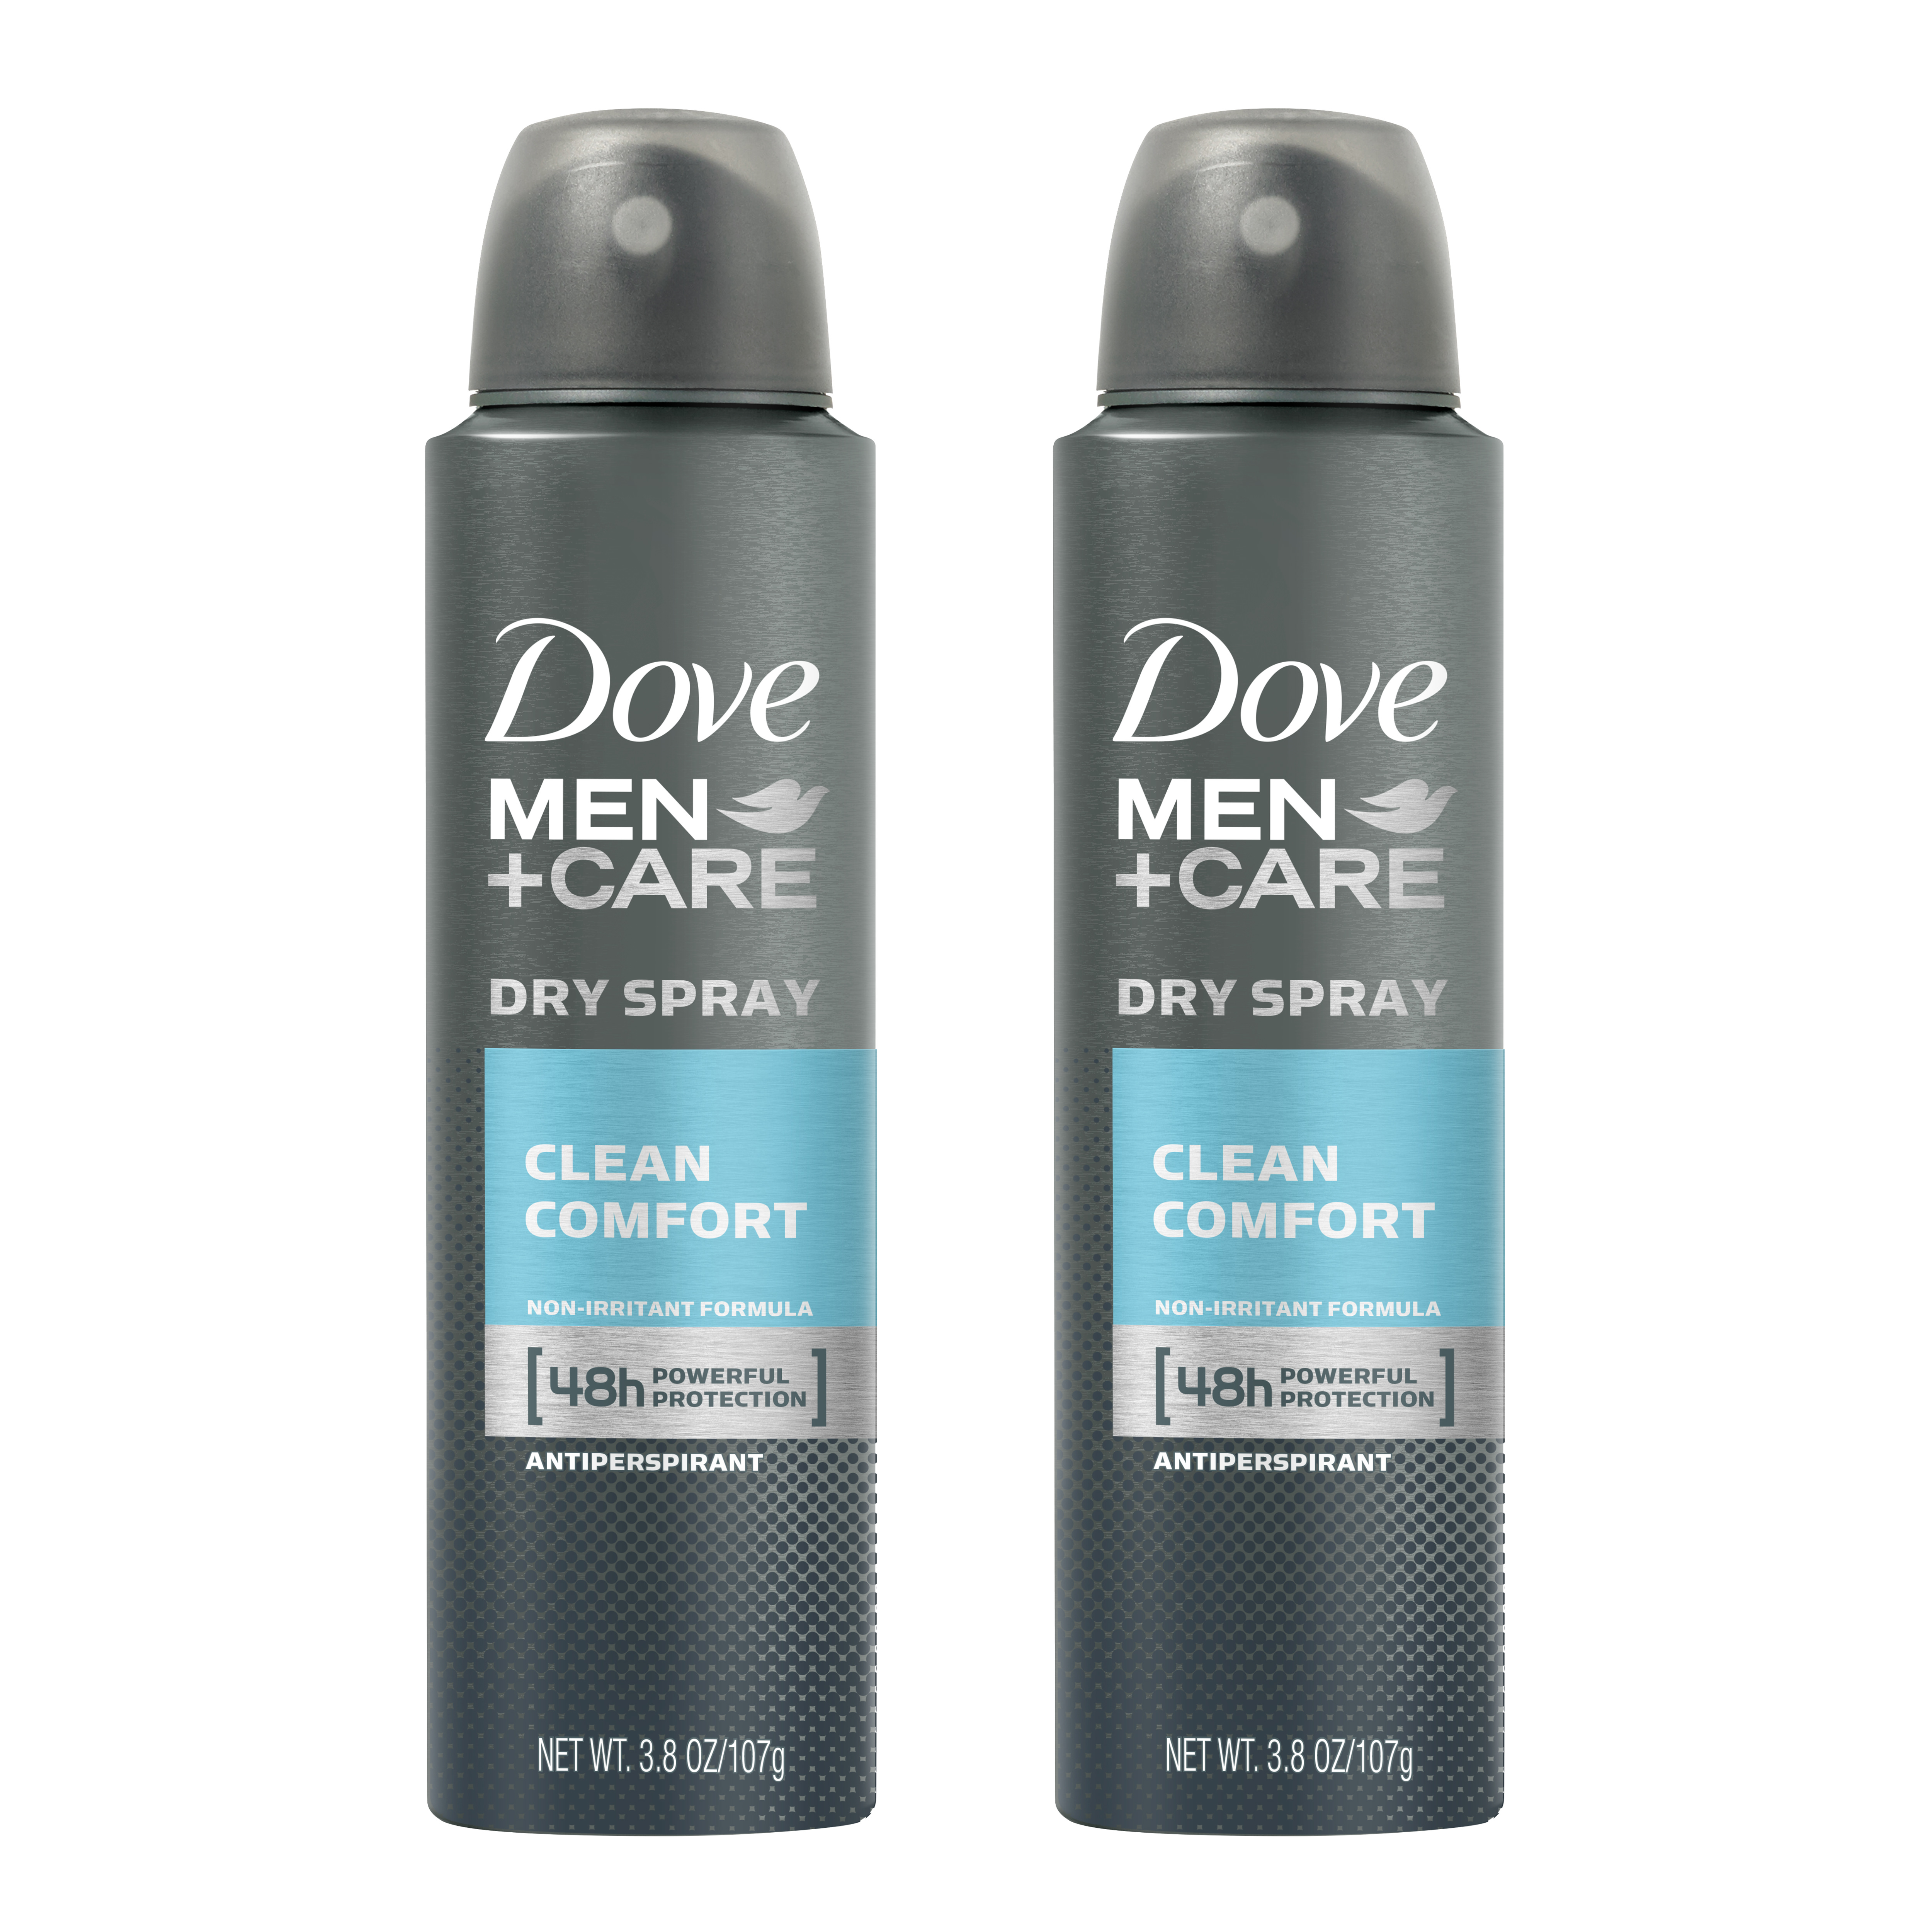 2 Pack Dove Men Care Dry Spray Antiperspirant Deodorant Clean Comfort 3 8 Oz Walmart Com Walmart Com